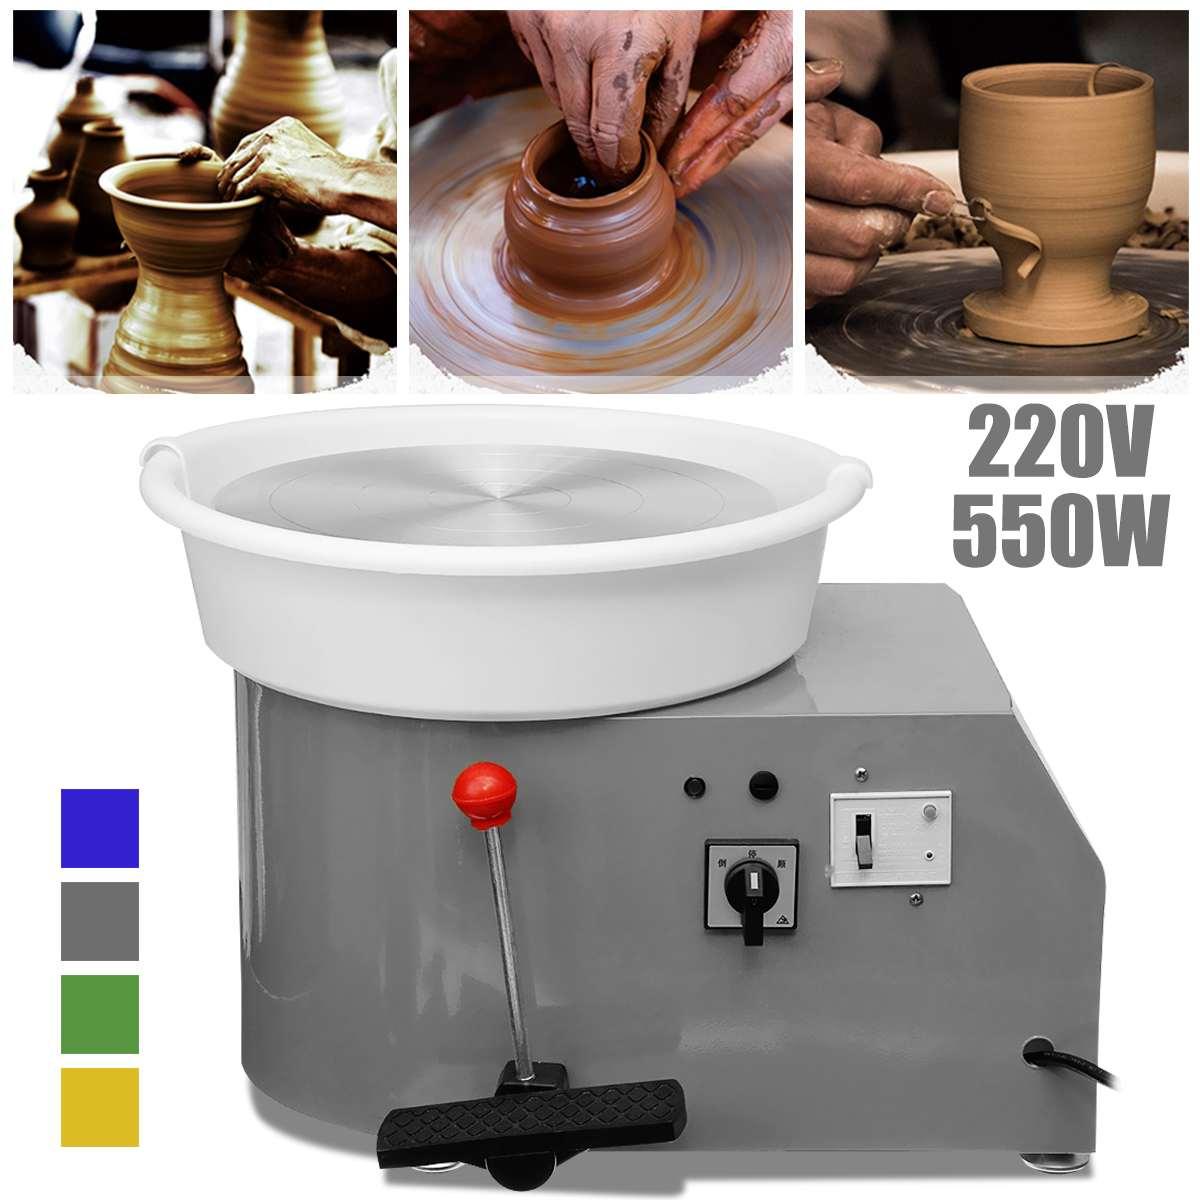 220V 550W Electric Pottery Wheel Ceramic Machine 300mm Ceramic Clay Potter Kit For Ceramic Work Ceramics